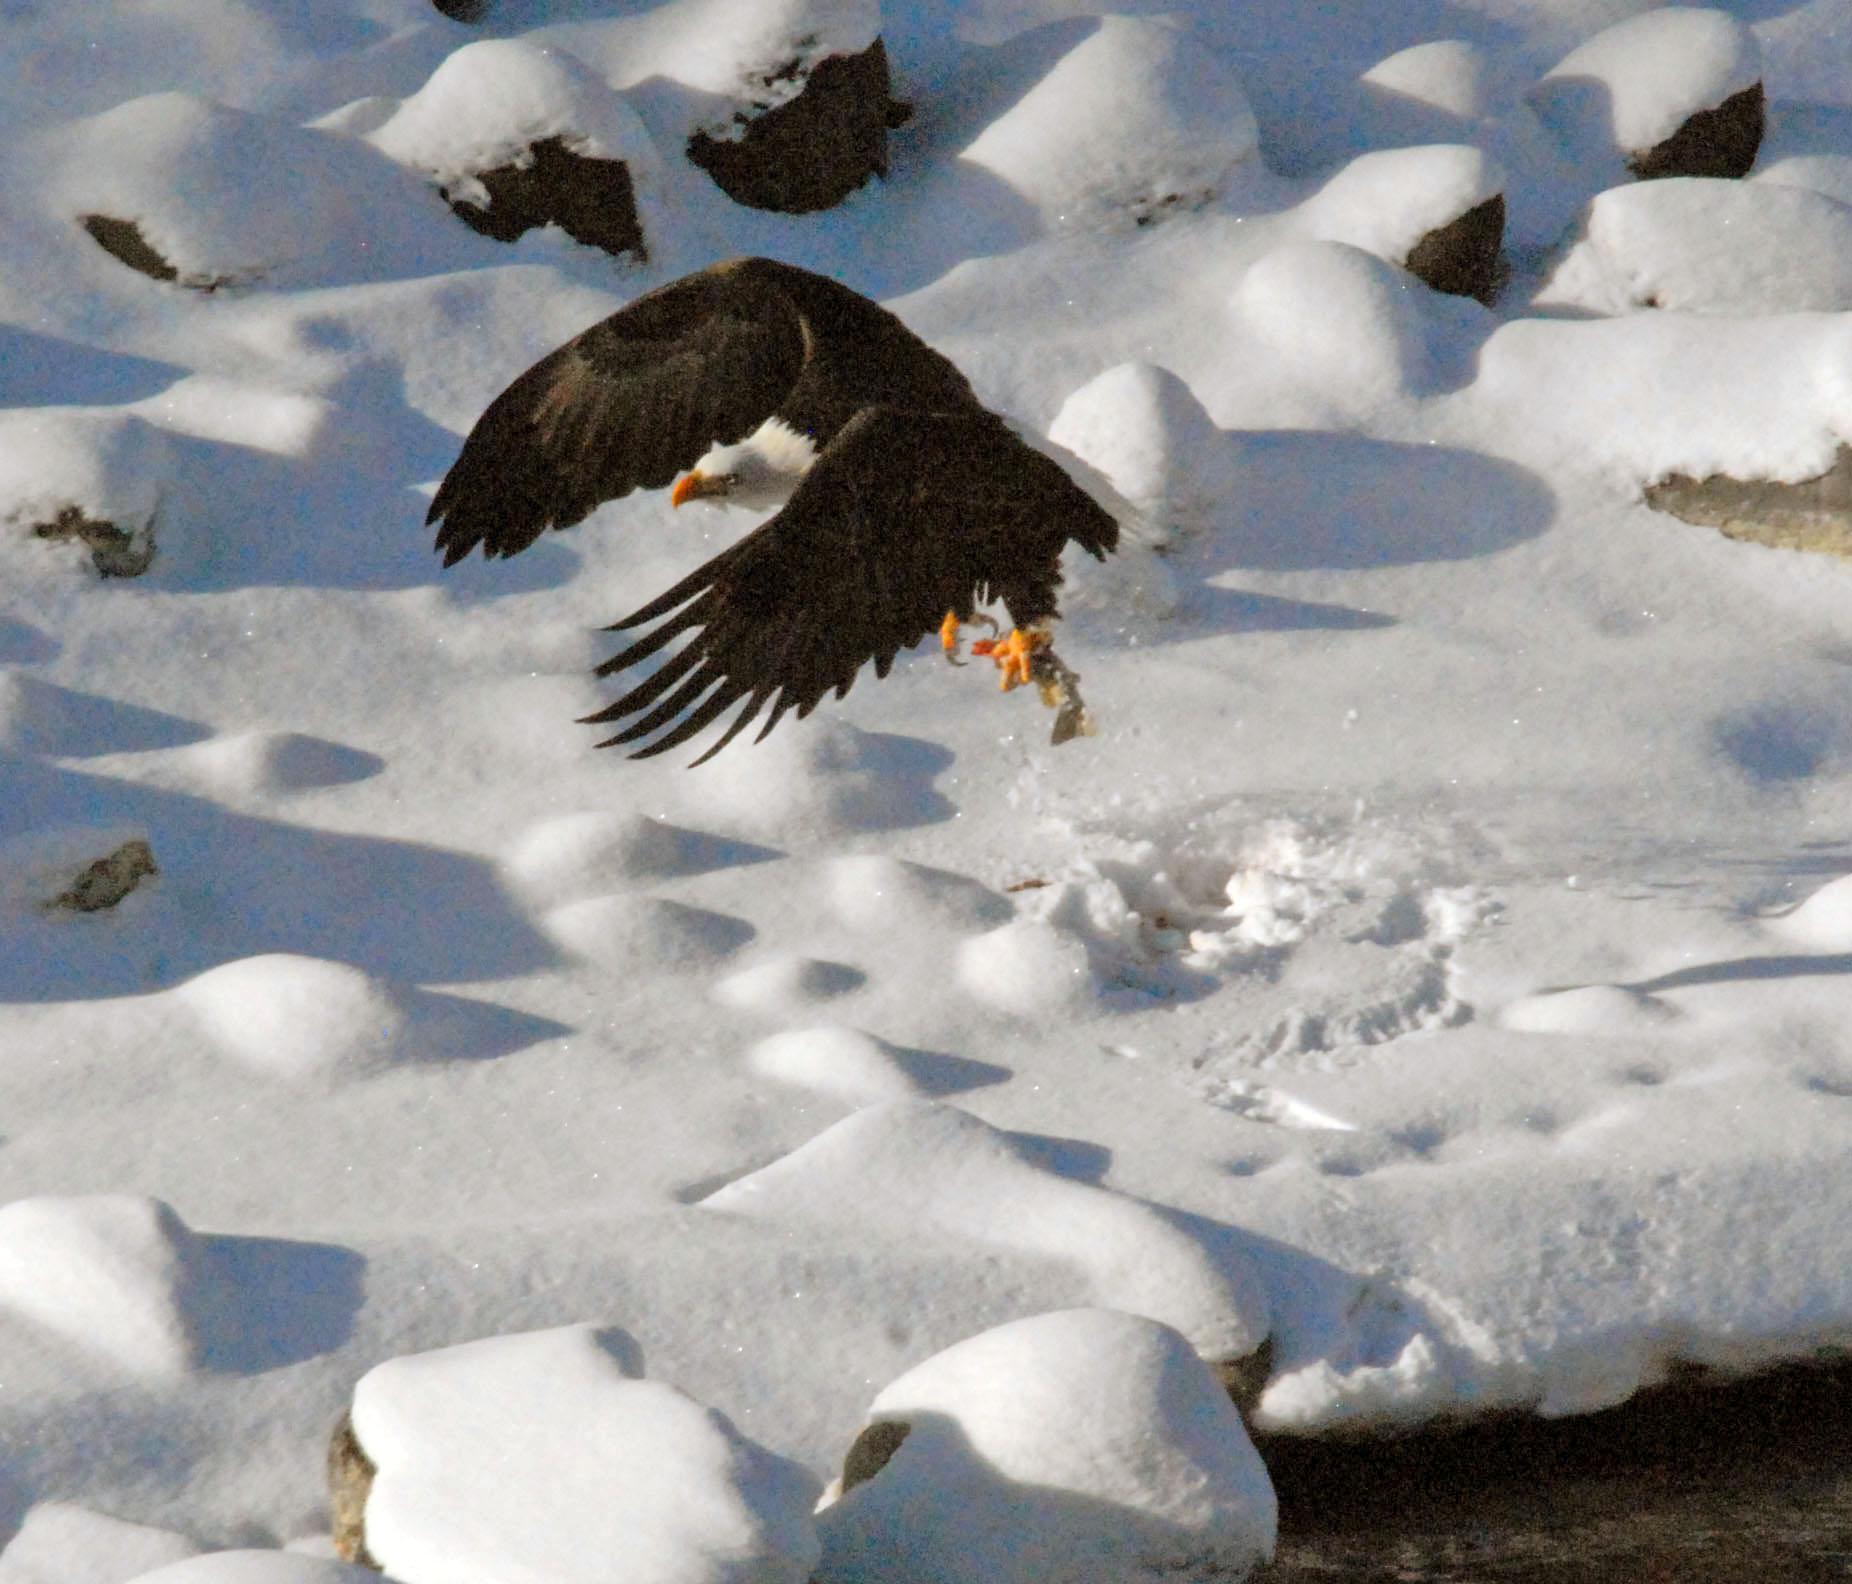 eagle with fish adj 2009 02 03 043